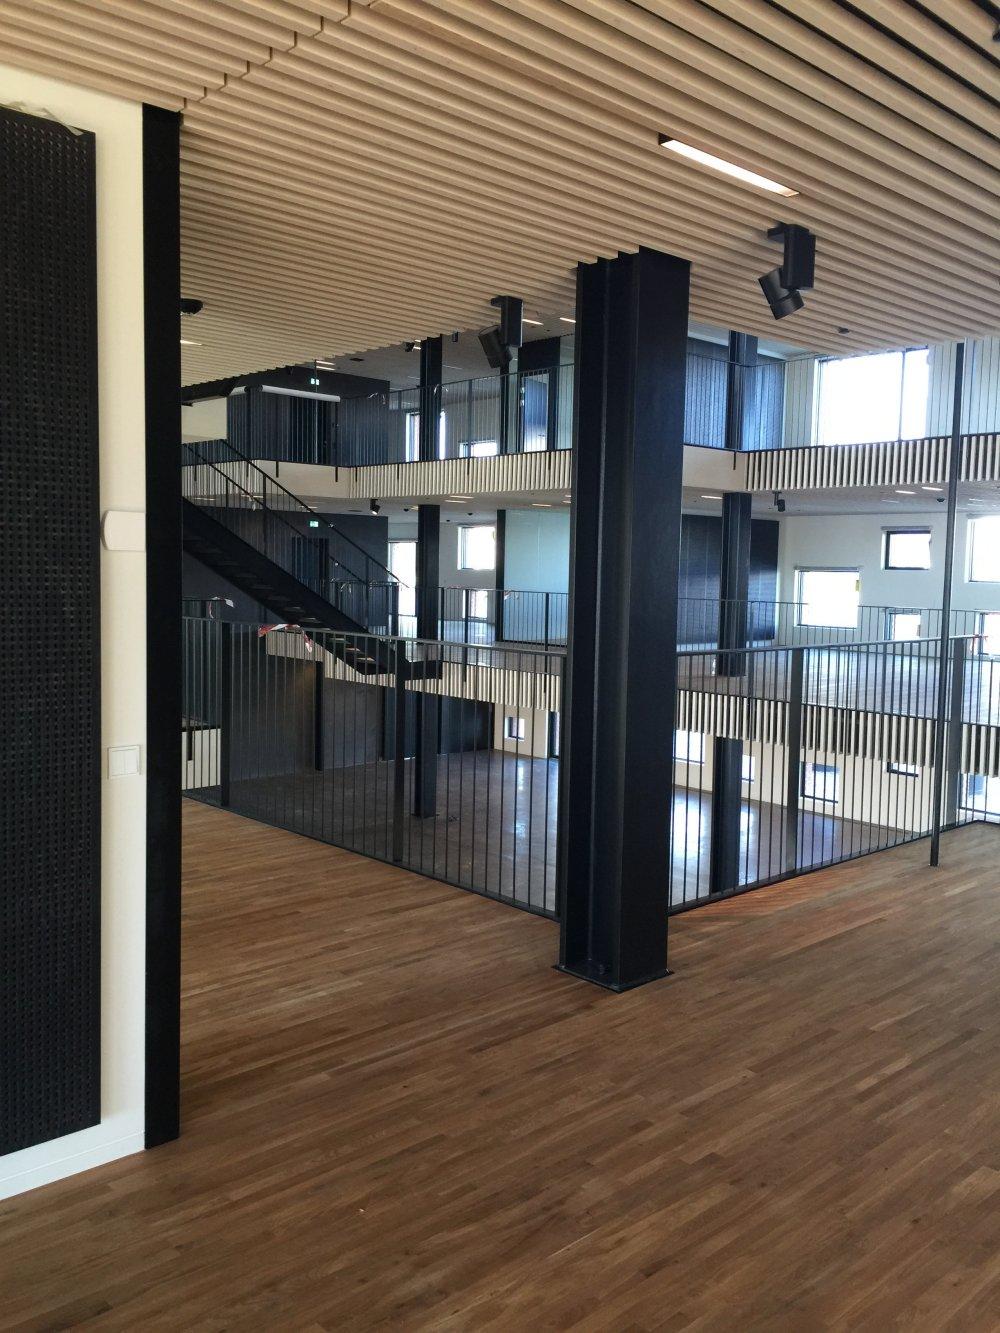 ATP har nyopført et pakhus på Langelinie